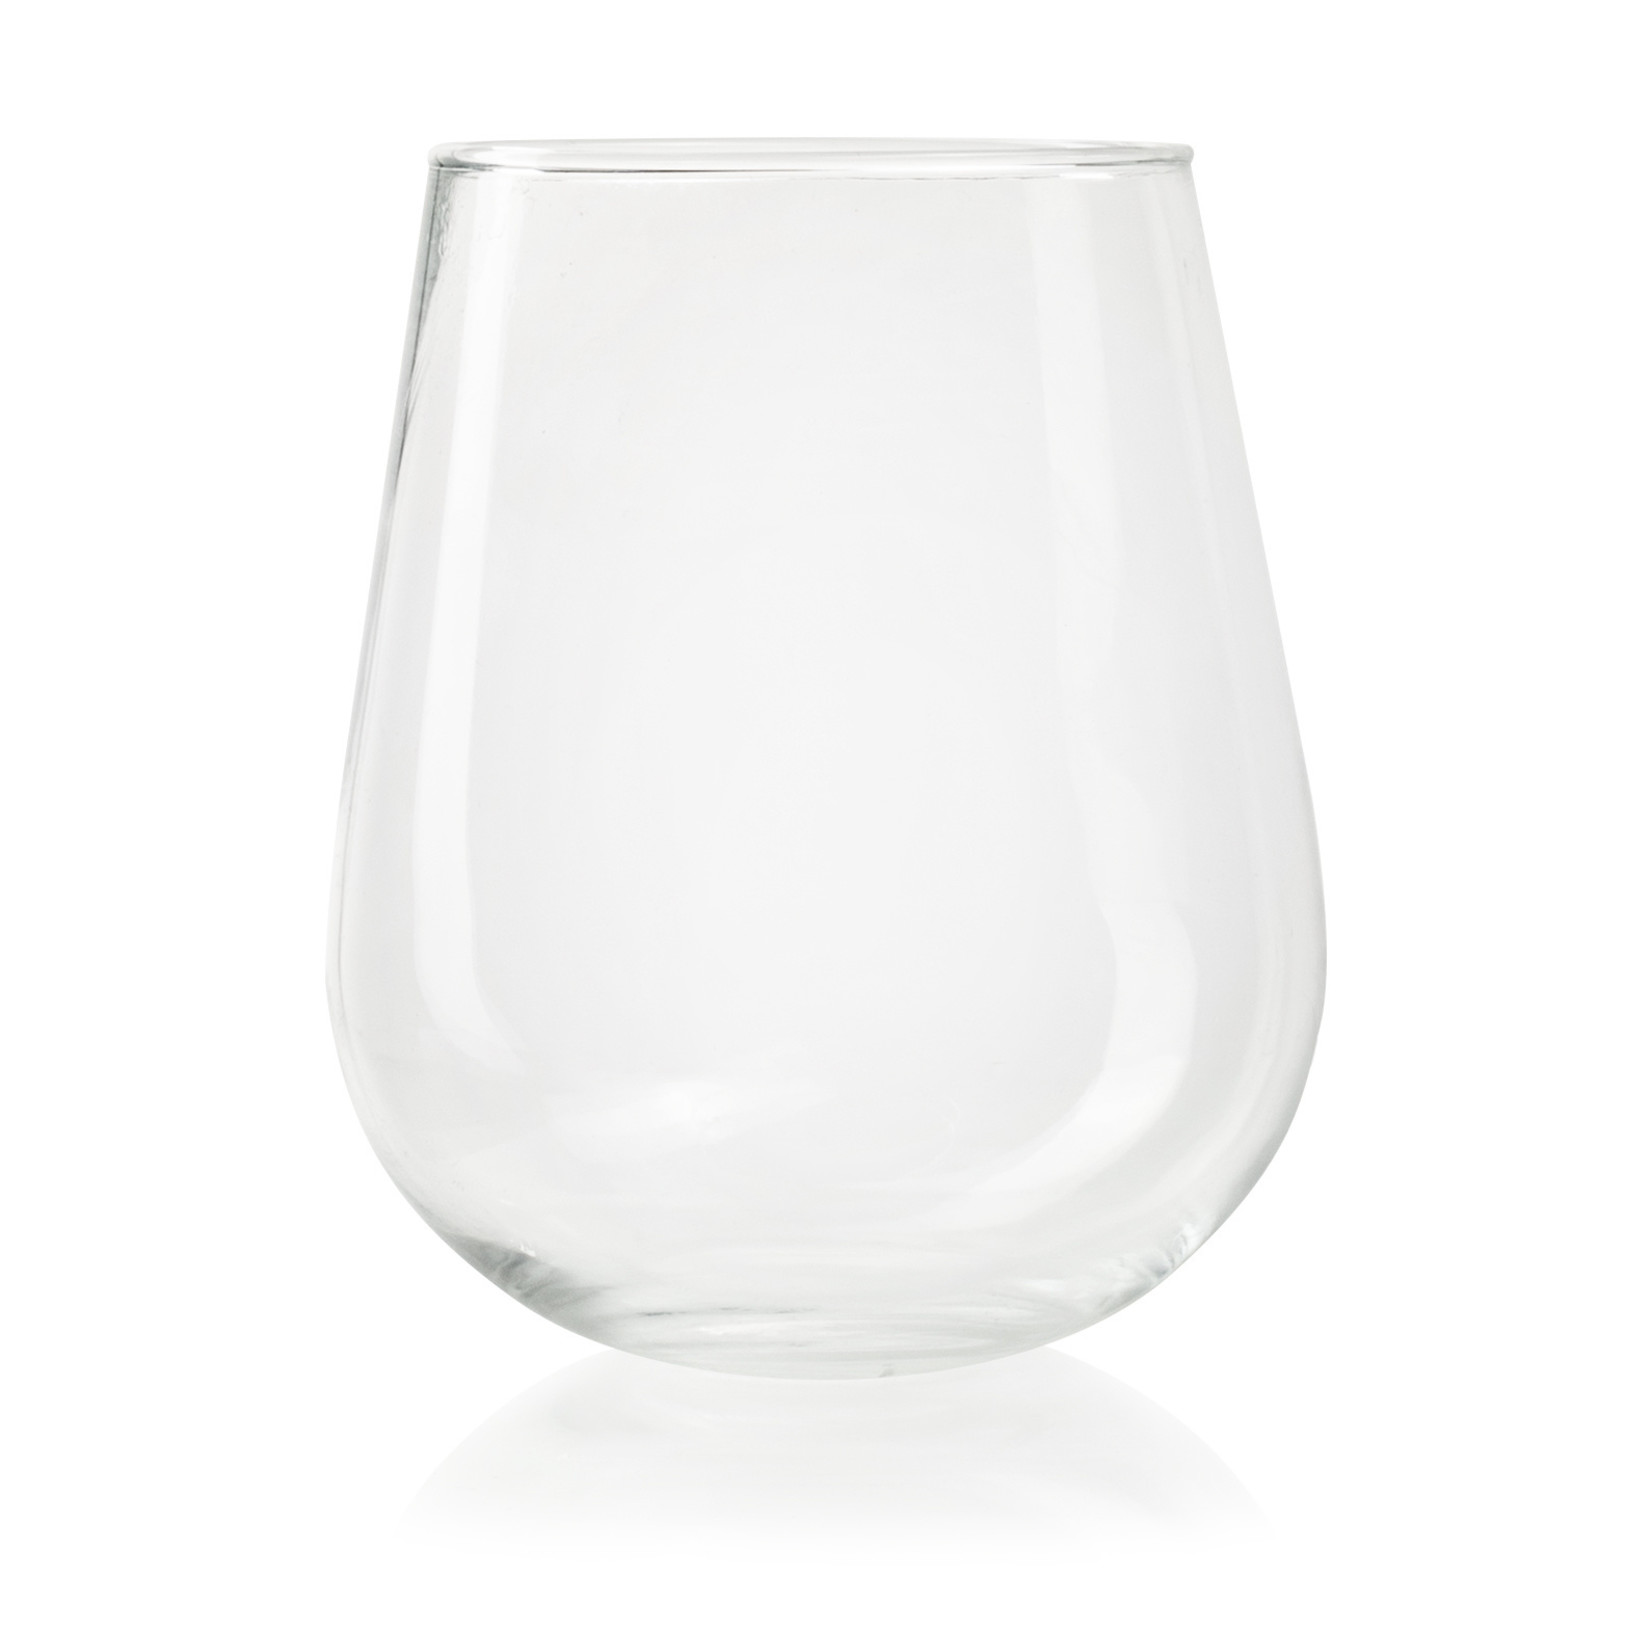 Jodeco Glass Glazen vaas 'Vani' H19 D12/16 cm Transparant